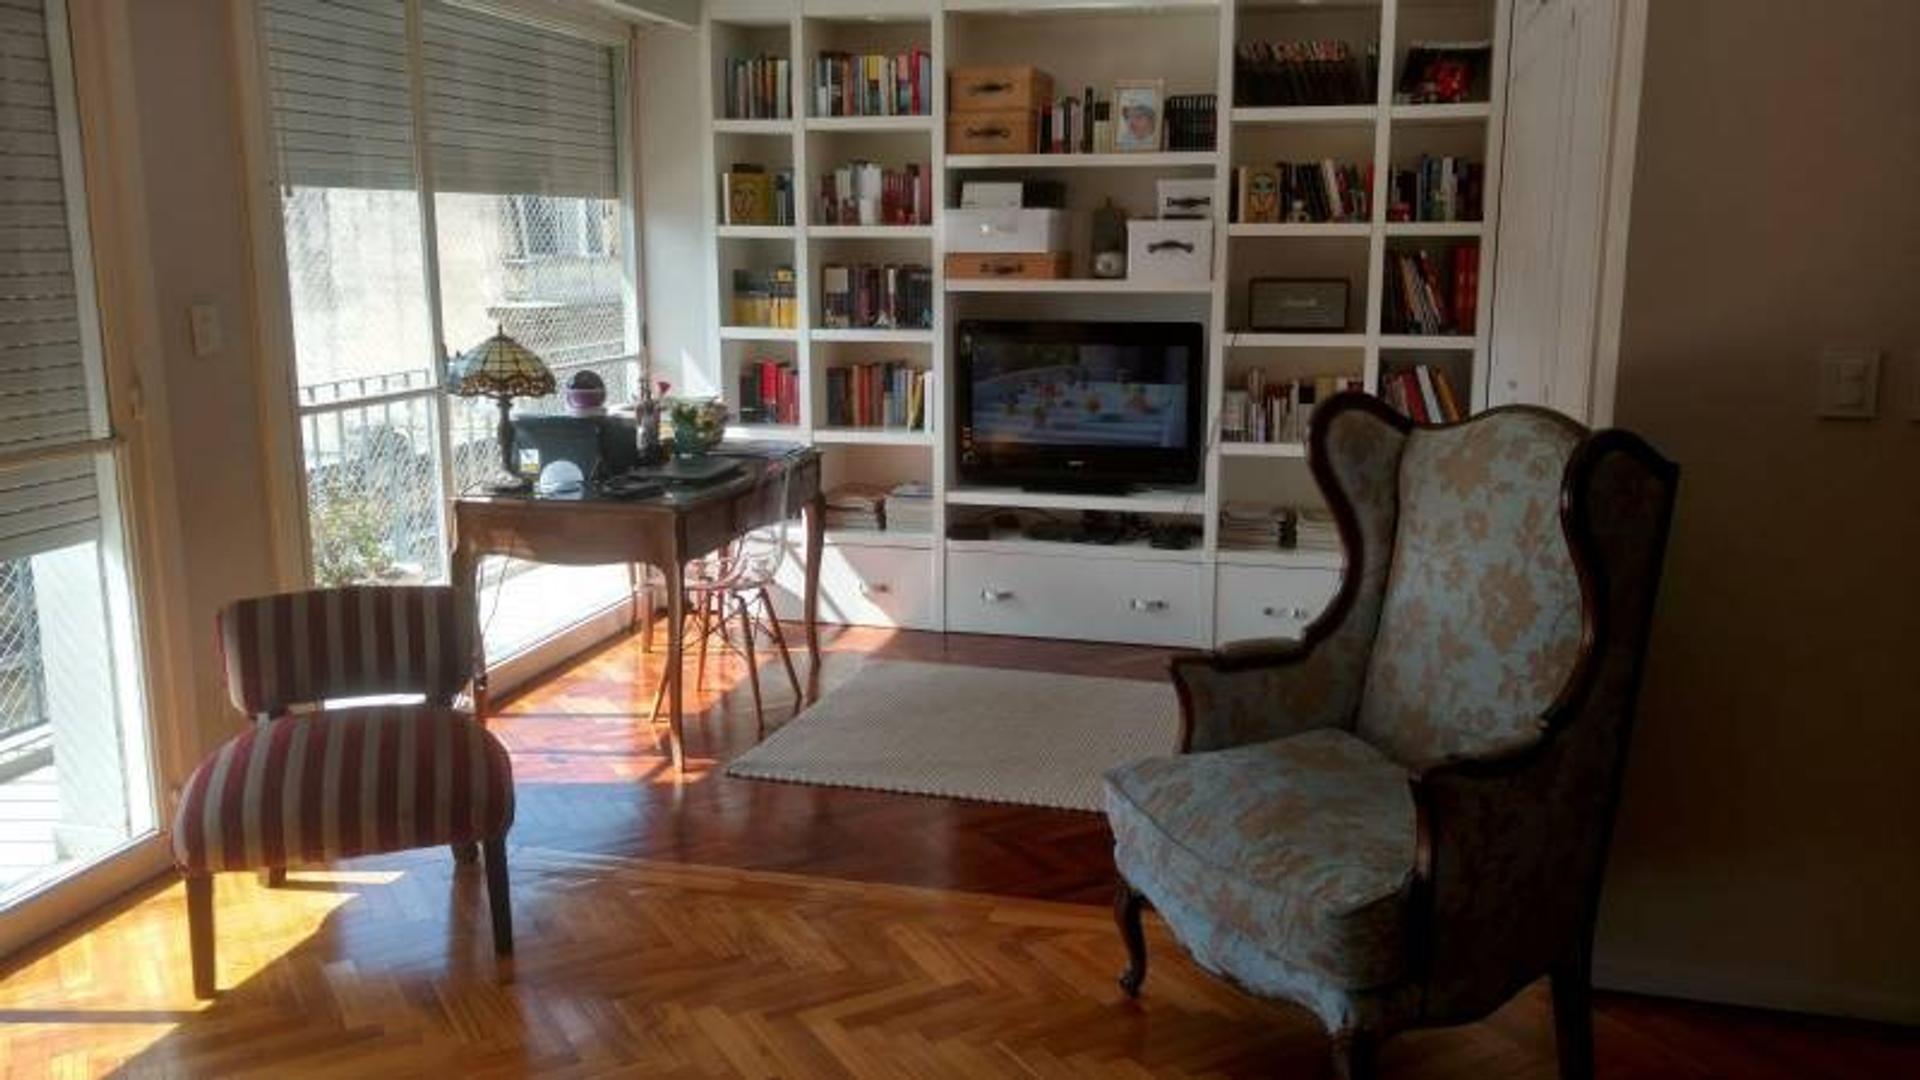 2 dormitorios con amplios ambientes a pasos de calle Córdoba